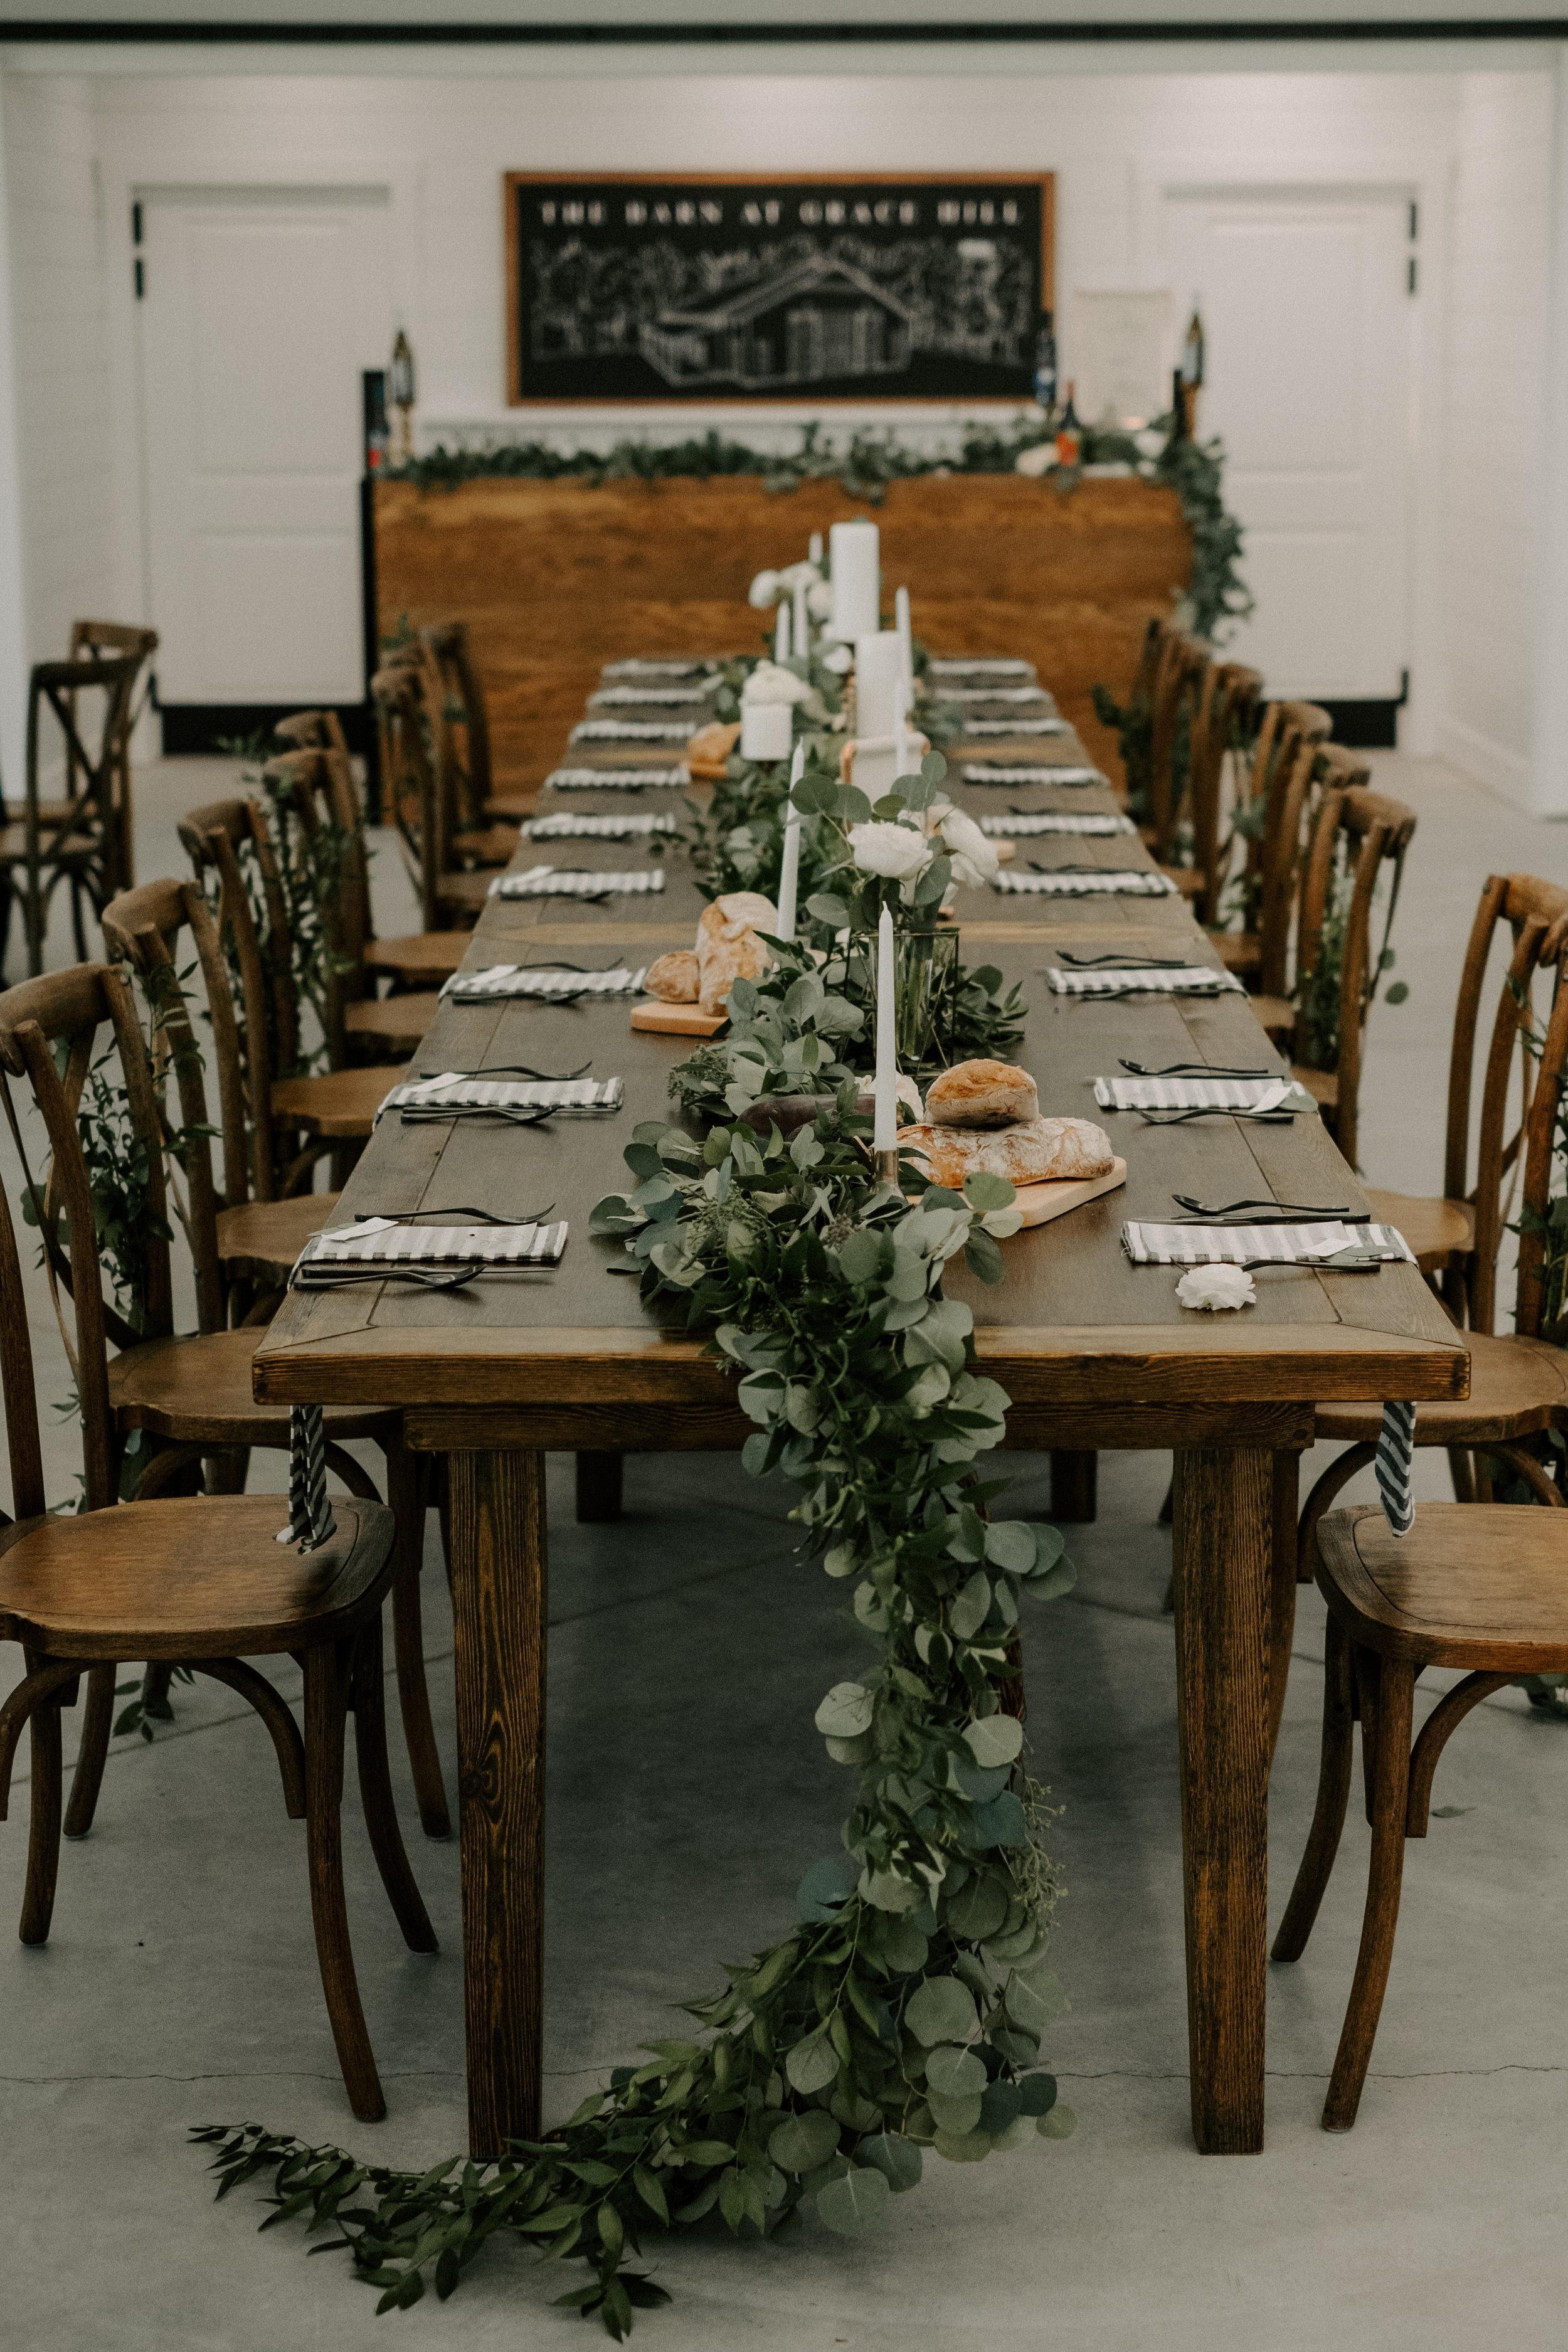 The-Barn-at-Grace-Hill-Wichita-Wedding-Venue-273.jpg